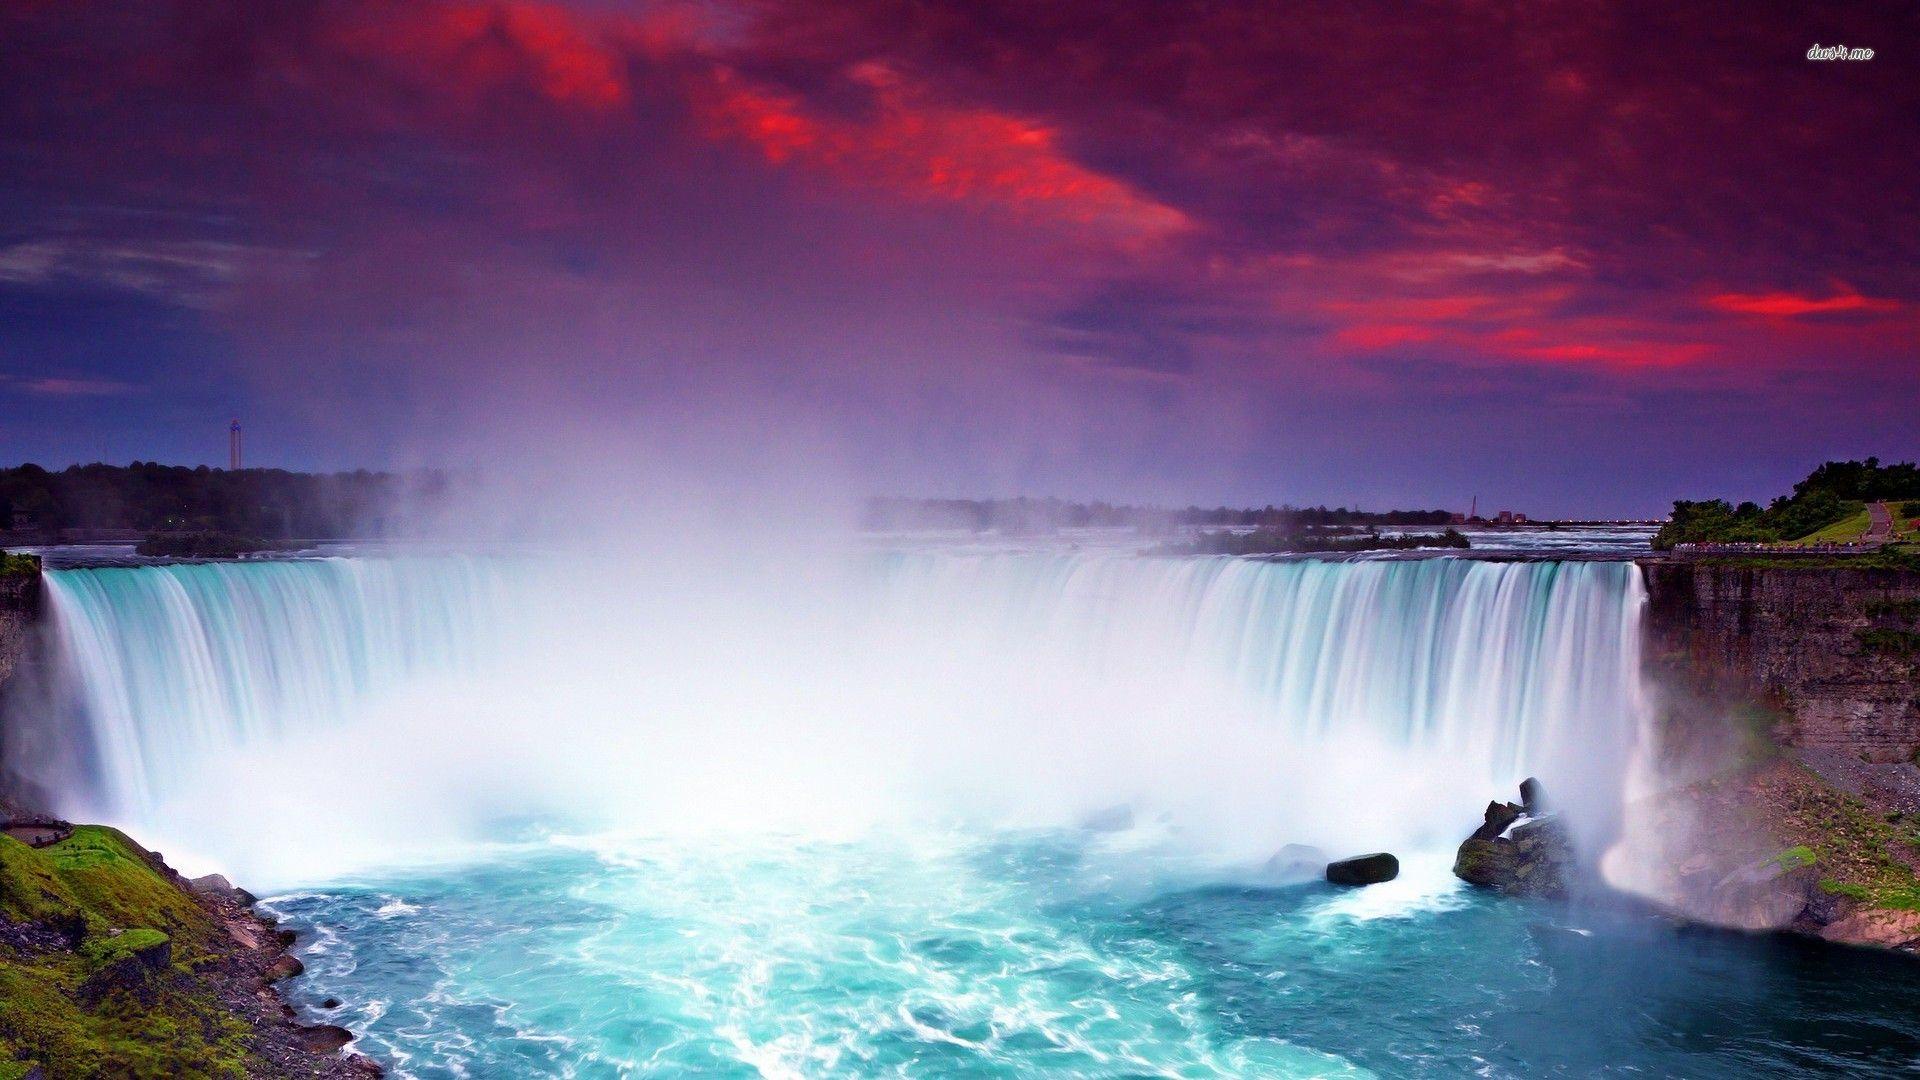 Niagara Falls Wallpaper Hd Hd Wallpapers High Definition High